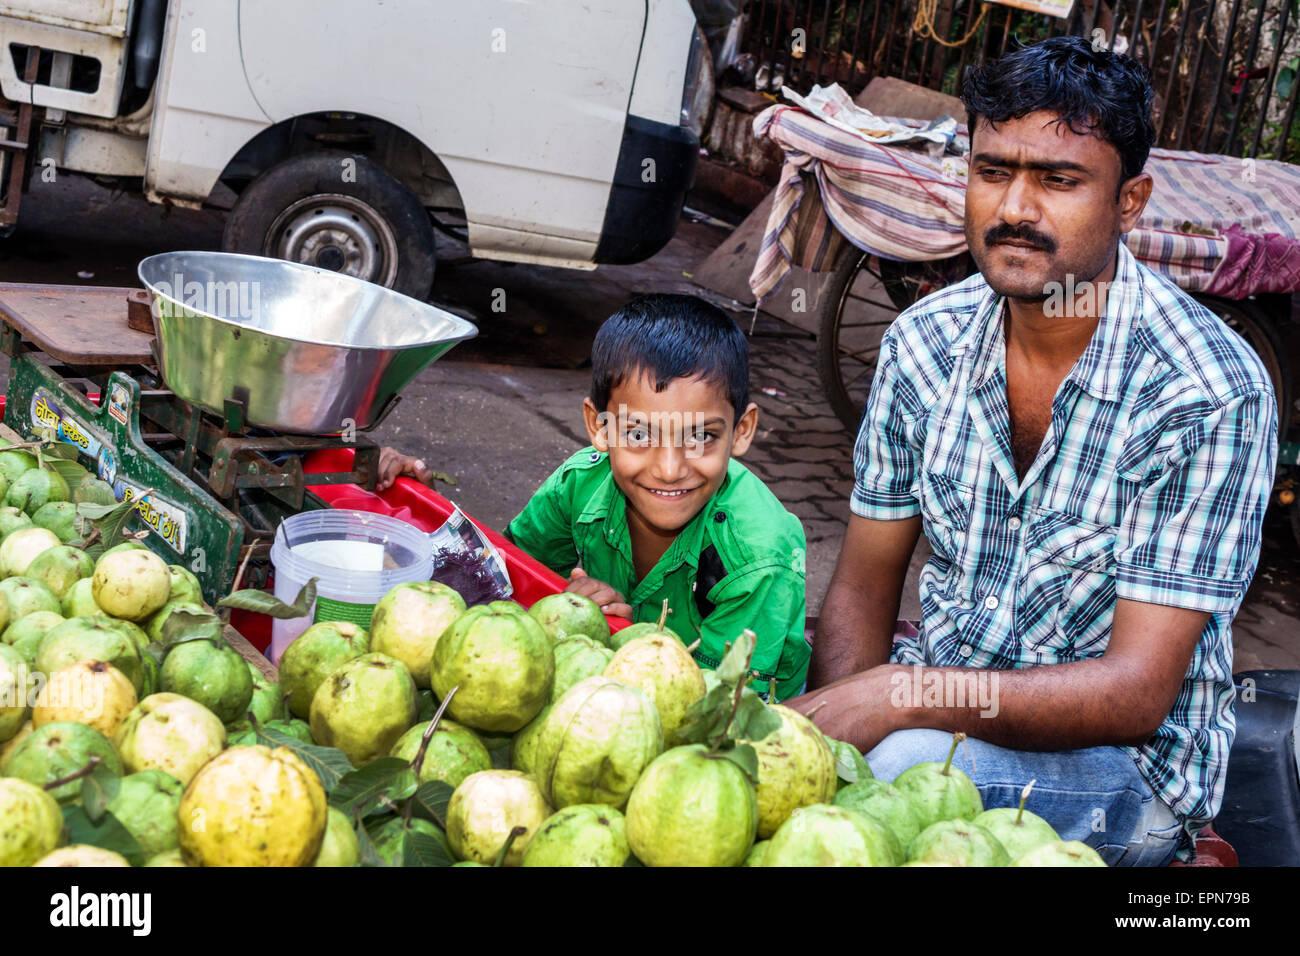 Mumbai India Asian Apollo Bandar Colaba Causeway Market Strand Cinema Road man produce vendor street father boy - Stock Image